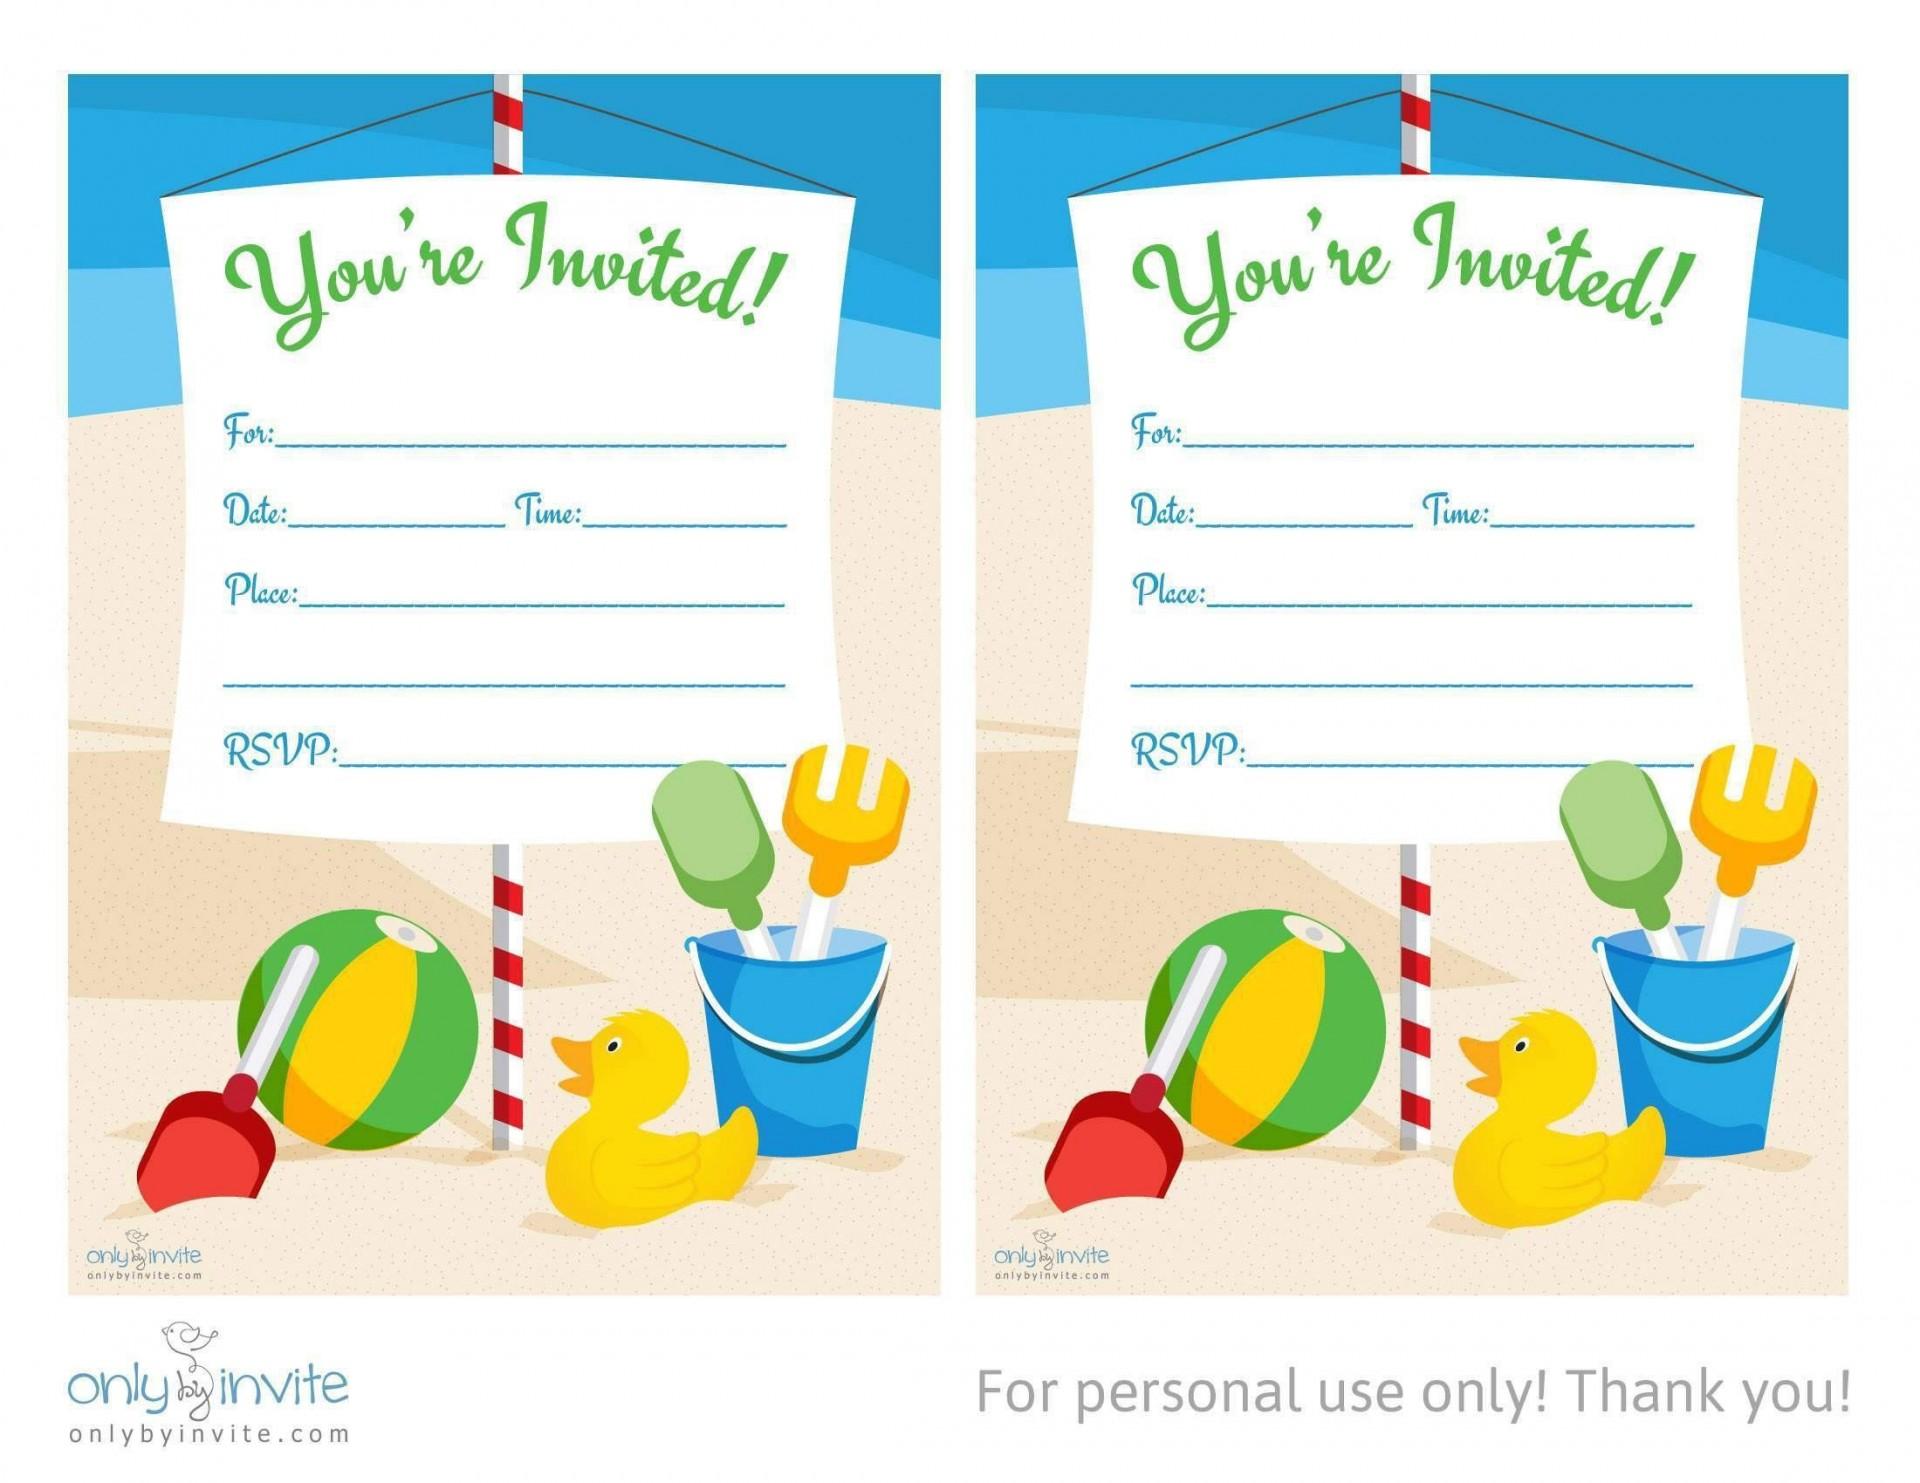 009 Singular Blank Birthday Card Template For Word Example  Free1920